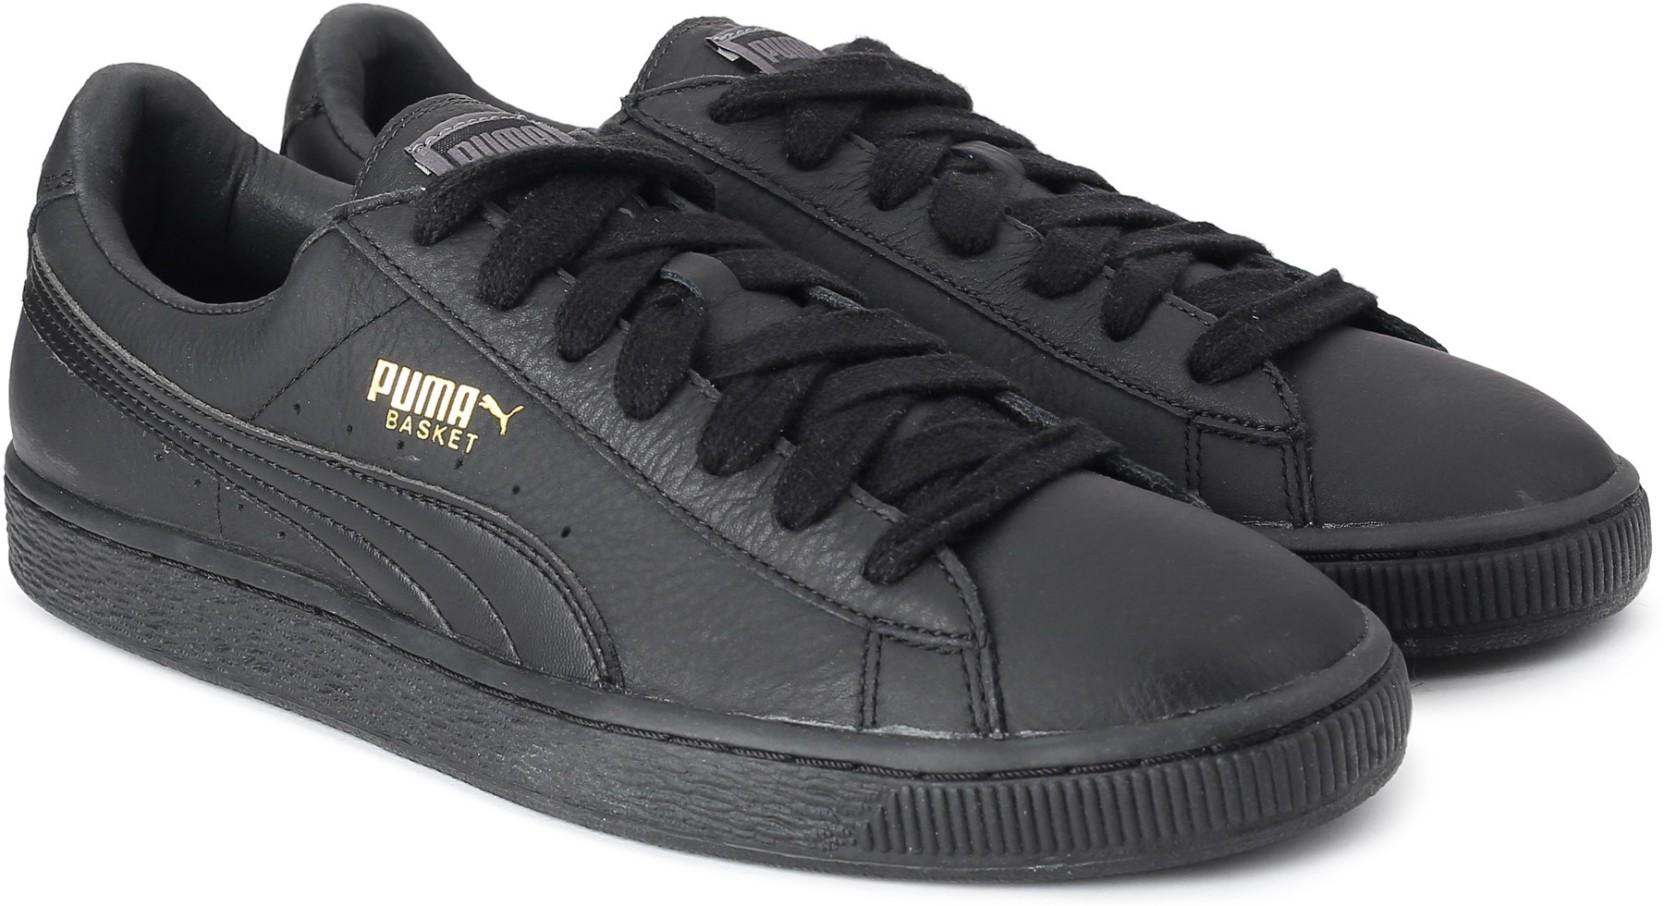 Puma Basket Classic LFS Sneakers For Men